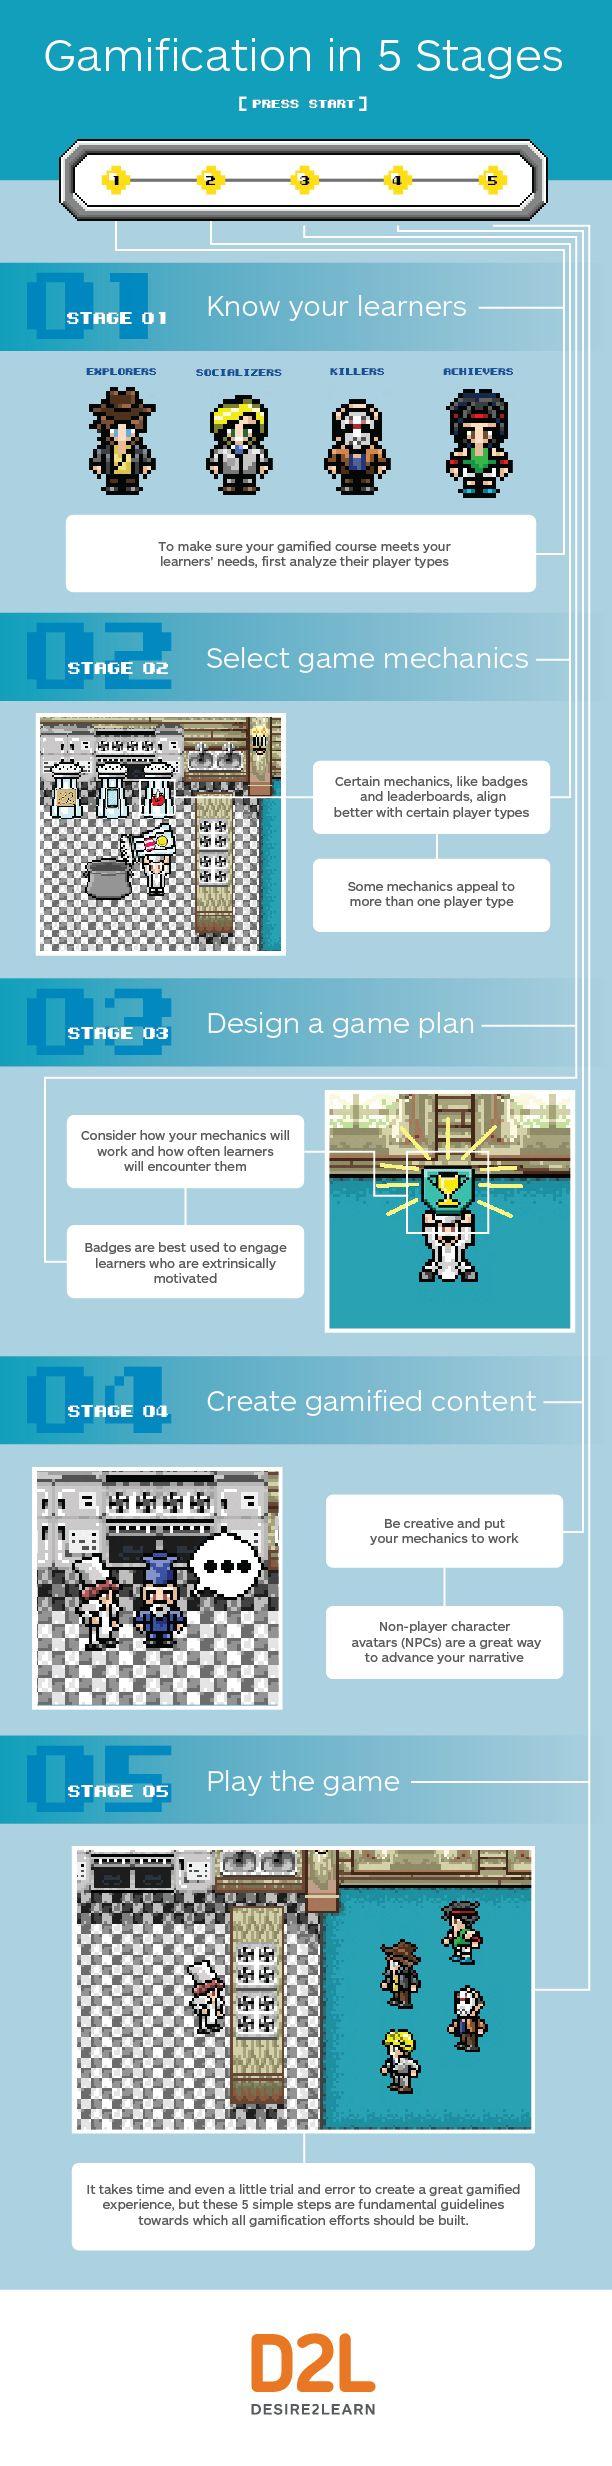 43 best Learning images on Pinterest | English language, Learning ...